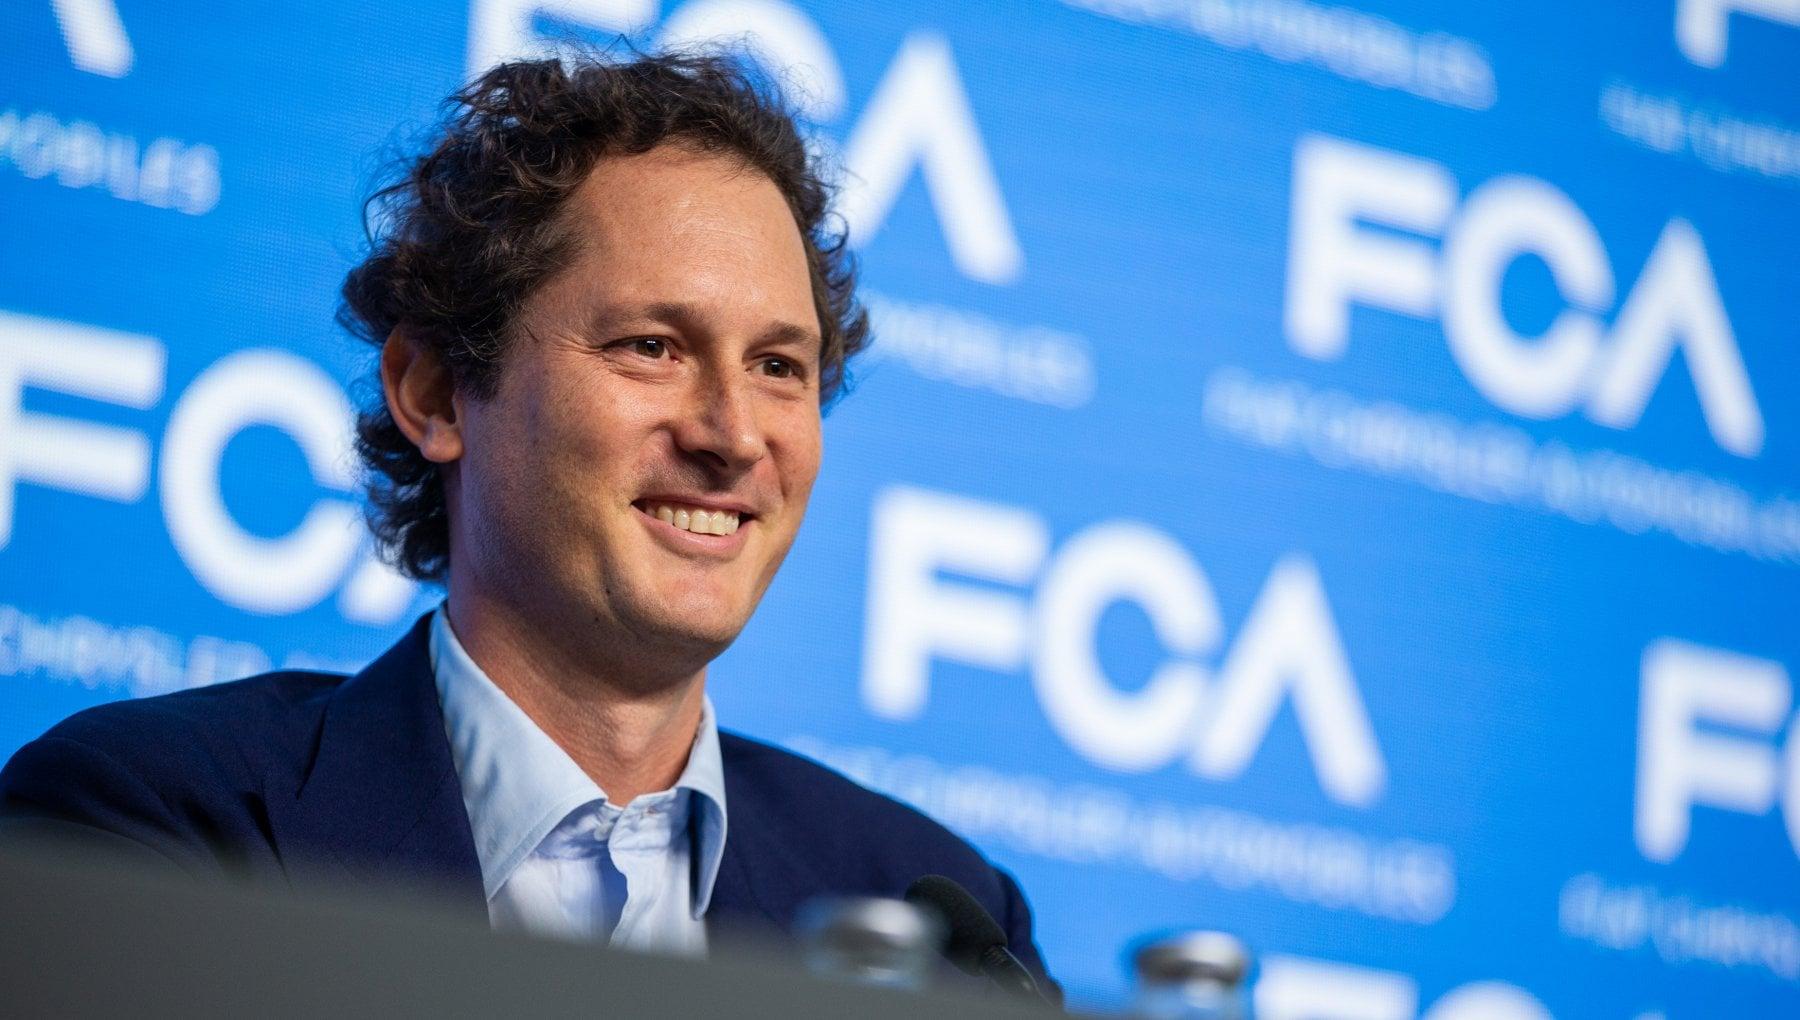 Ferrari si dimette Camilleri John Elkann ad a interim